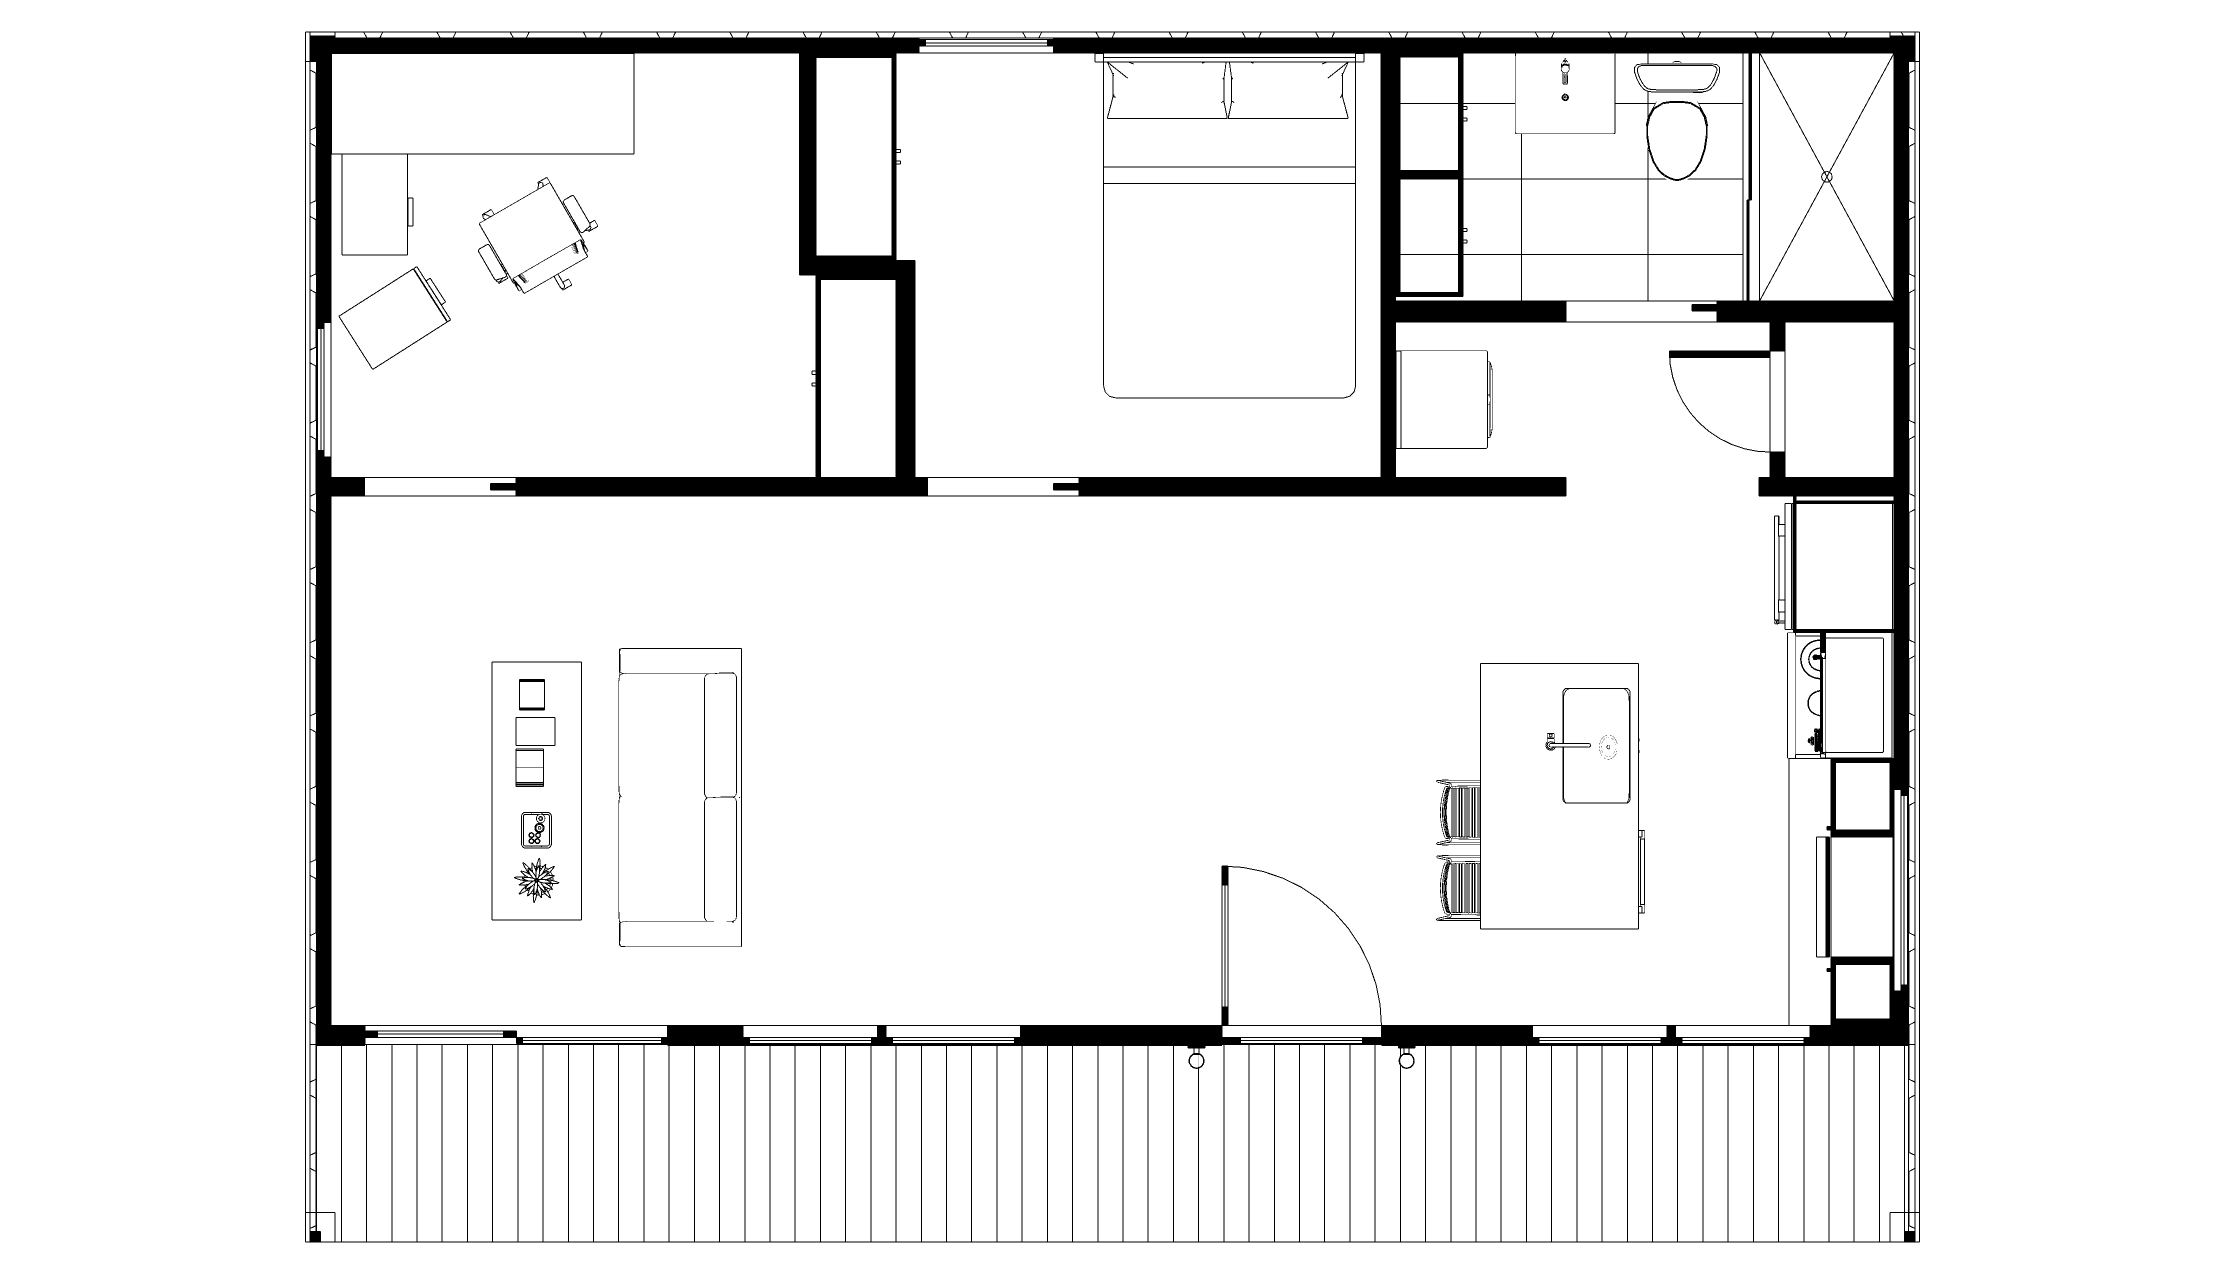 Adu Models Bay Modular Prefab Homes Modular Buildings Sustainable Modern Turnkey Architecture Accessory Dwelling Units Backyard Homes Bay Area Oakland San Francisco San Jose